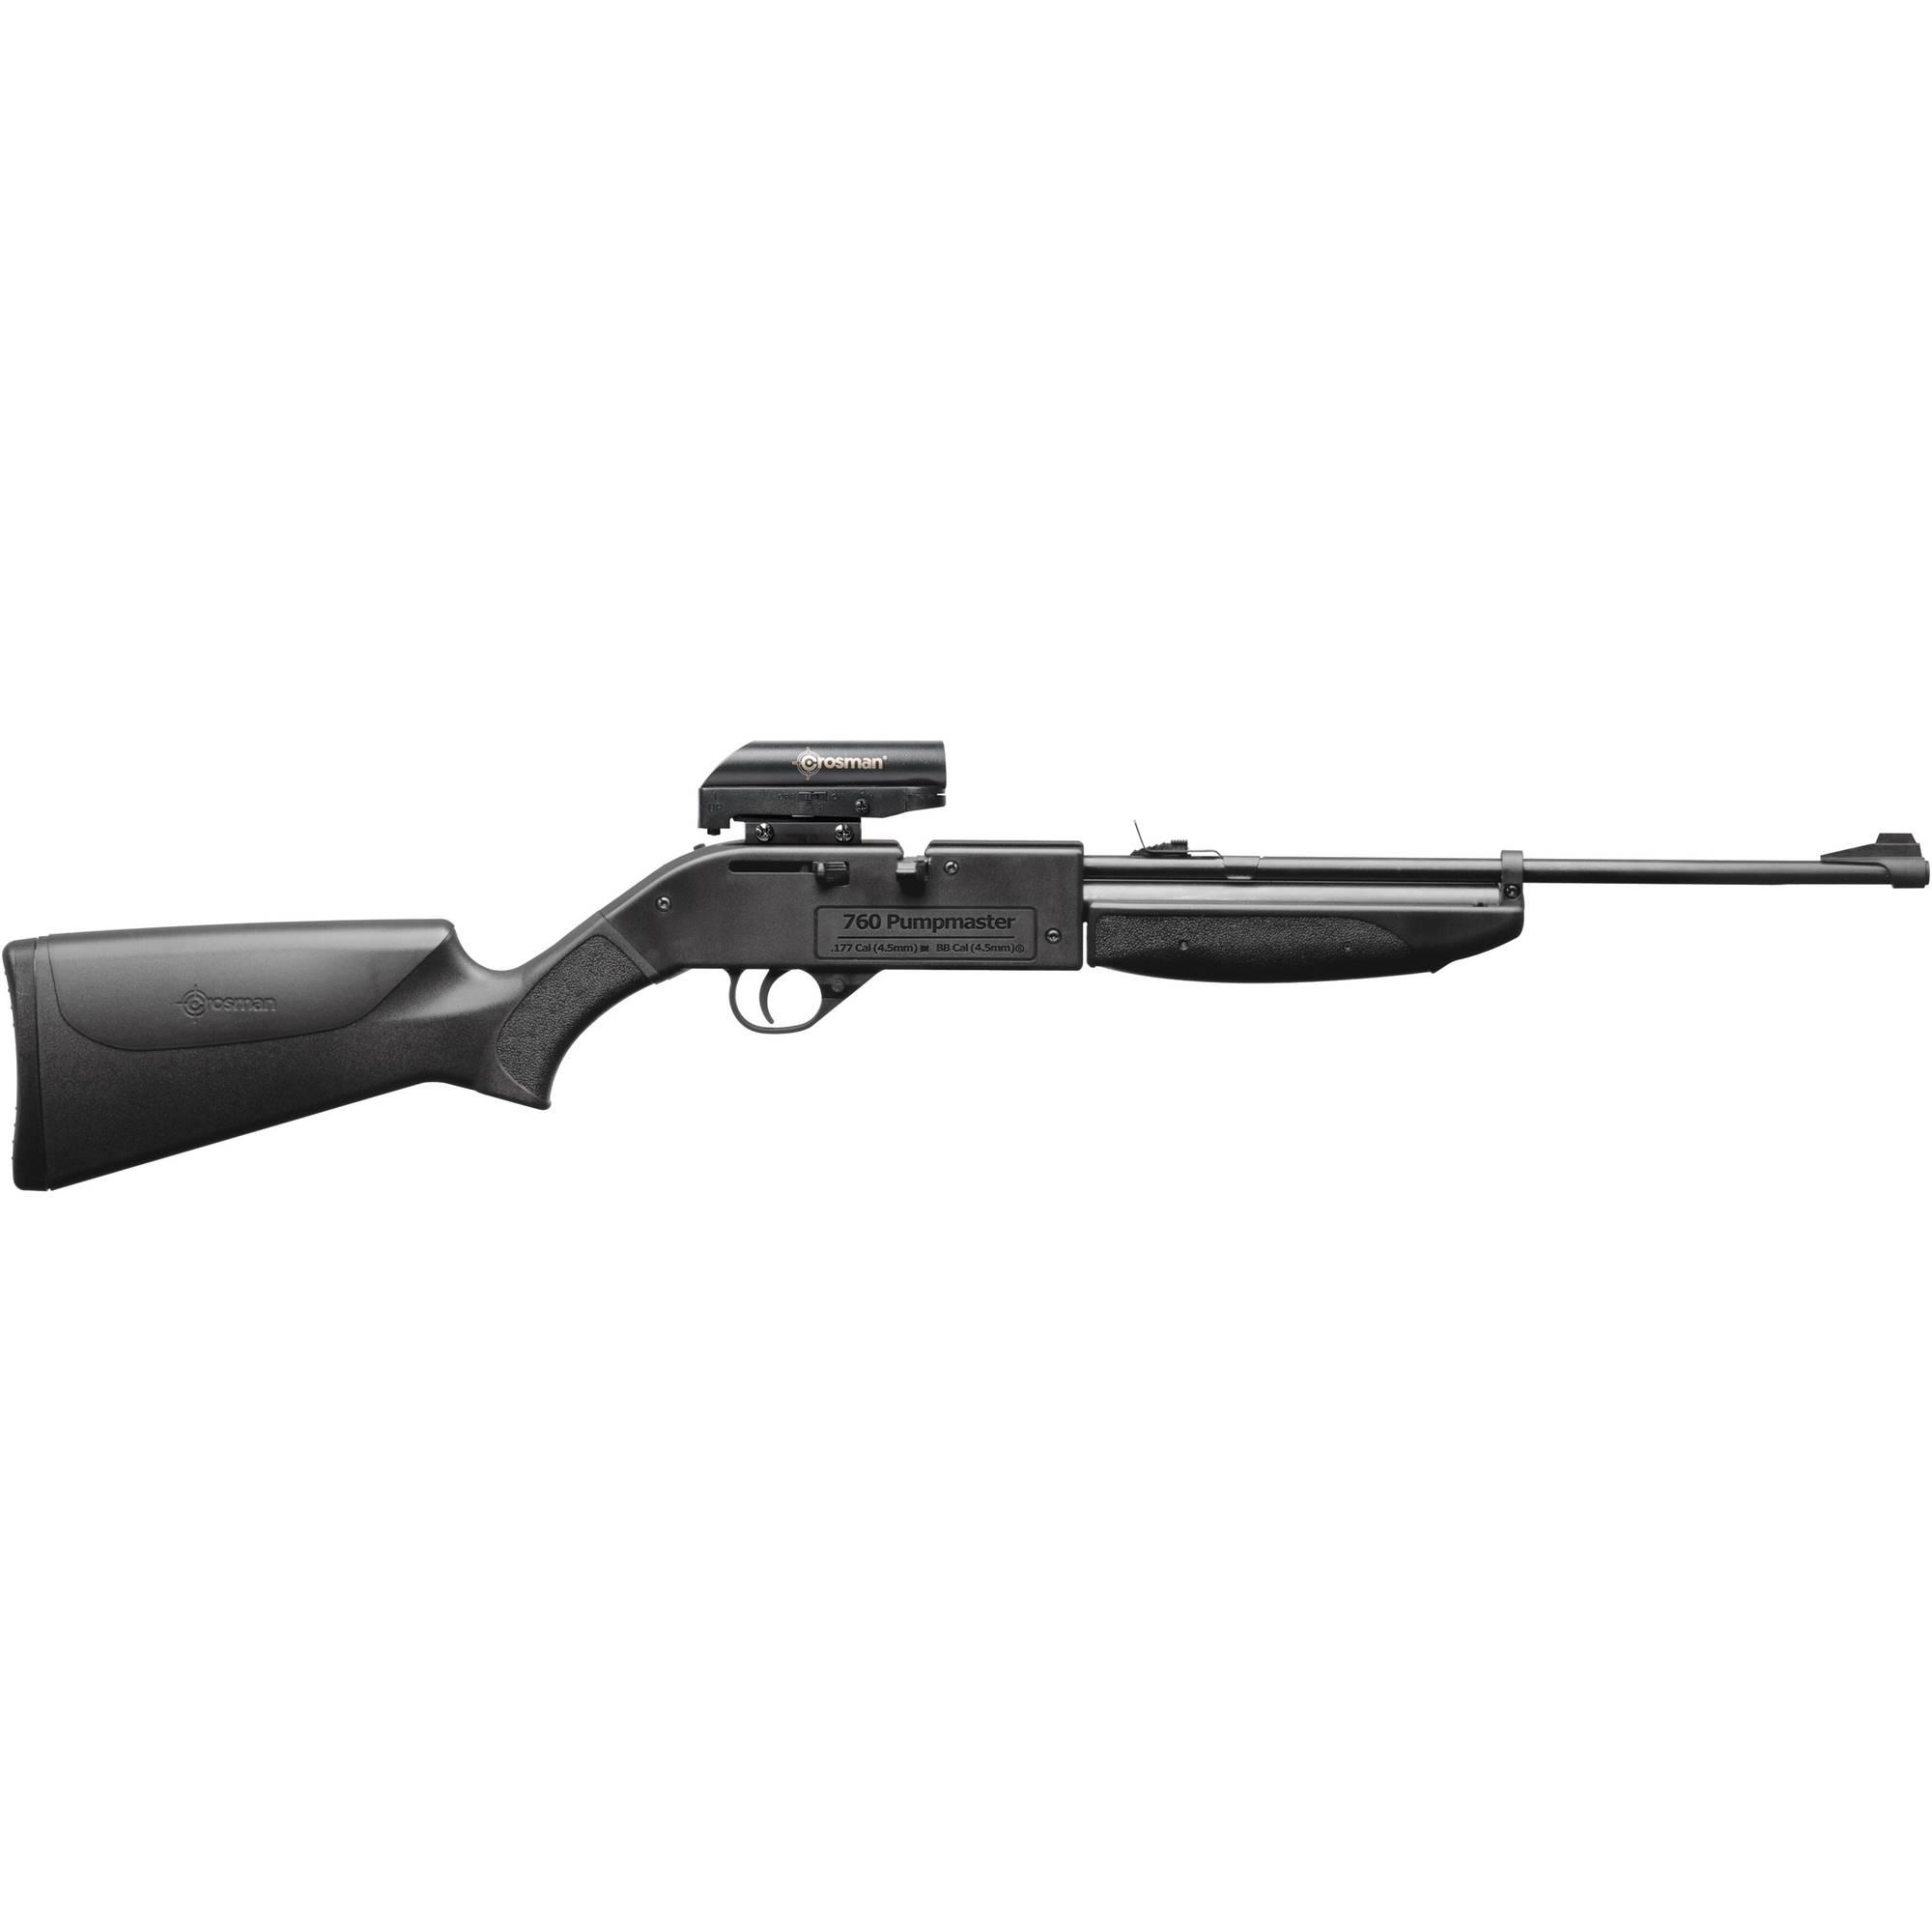 Crosman 760 Pumpmaster .177 Caliber Multi-Pump Air Rifle with Red Dot Sight